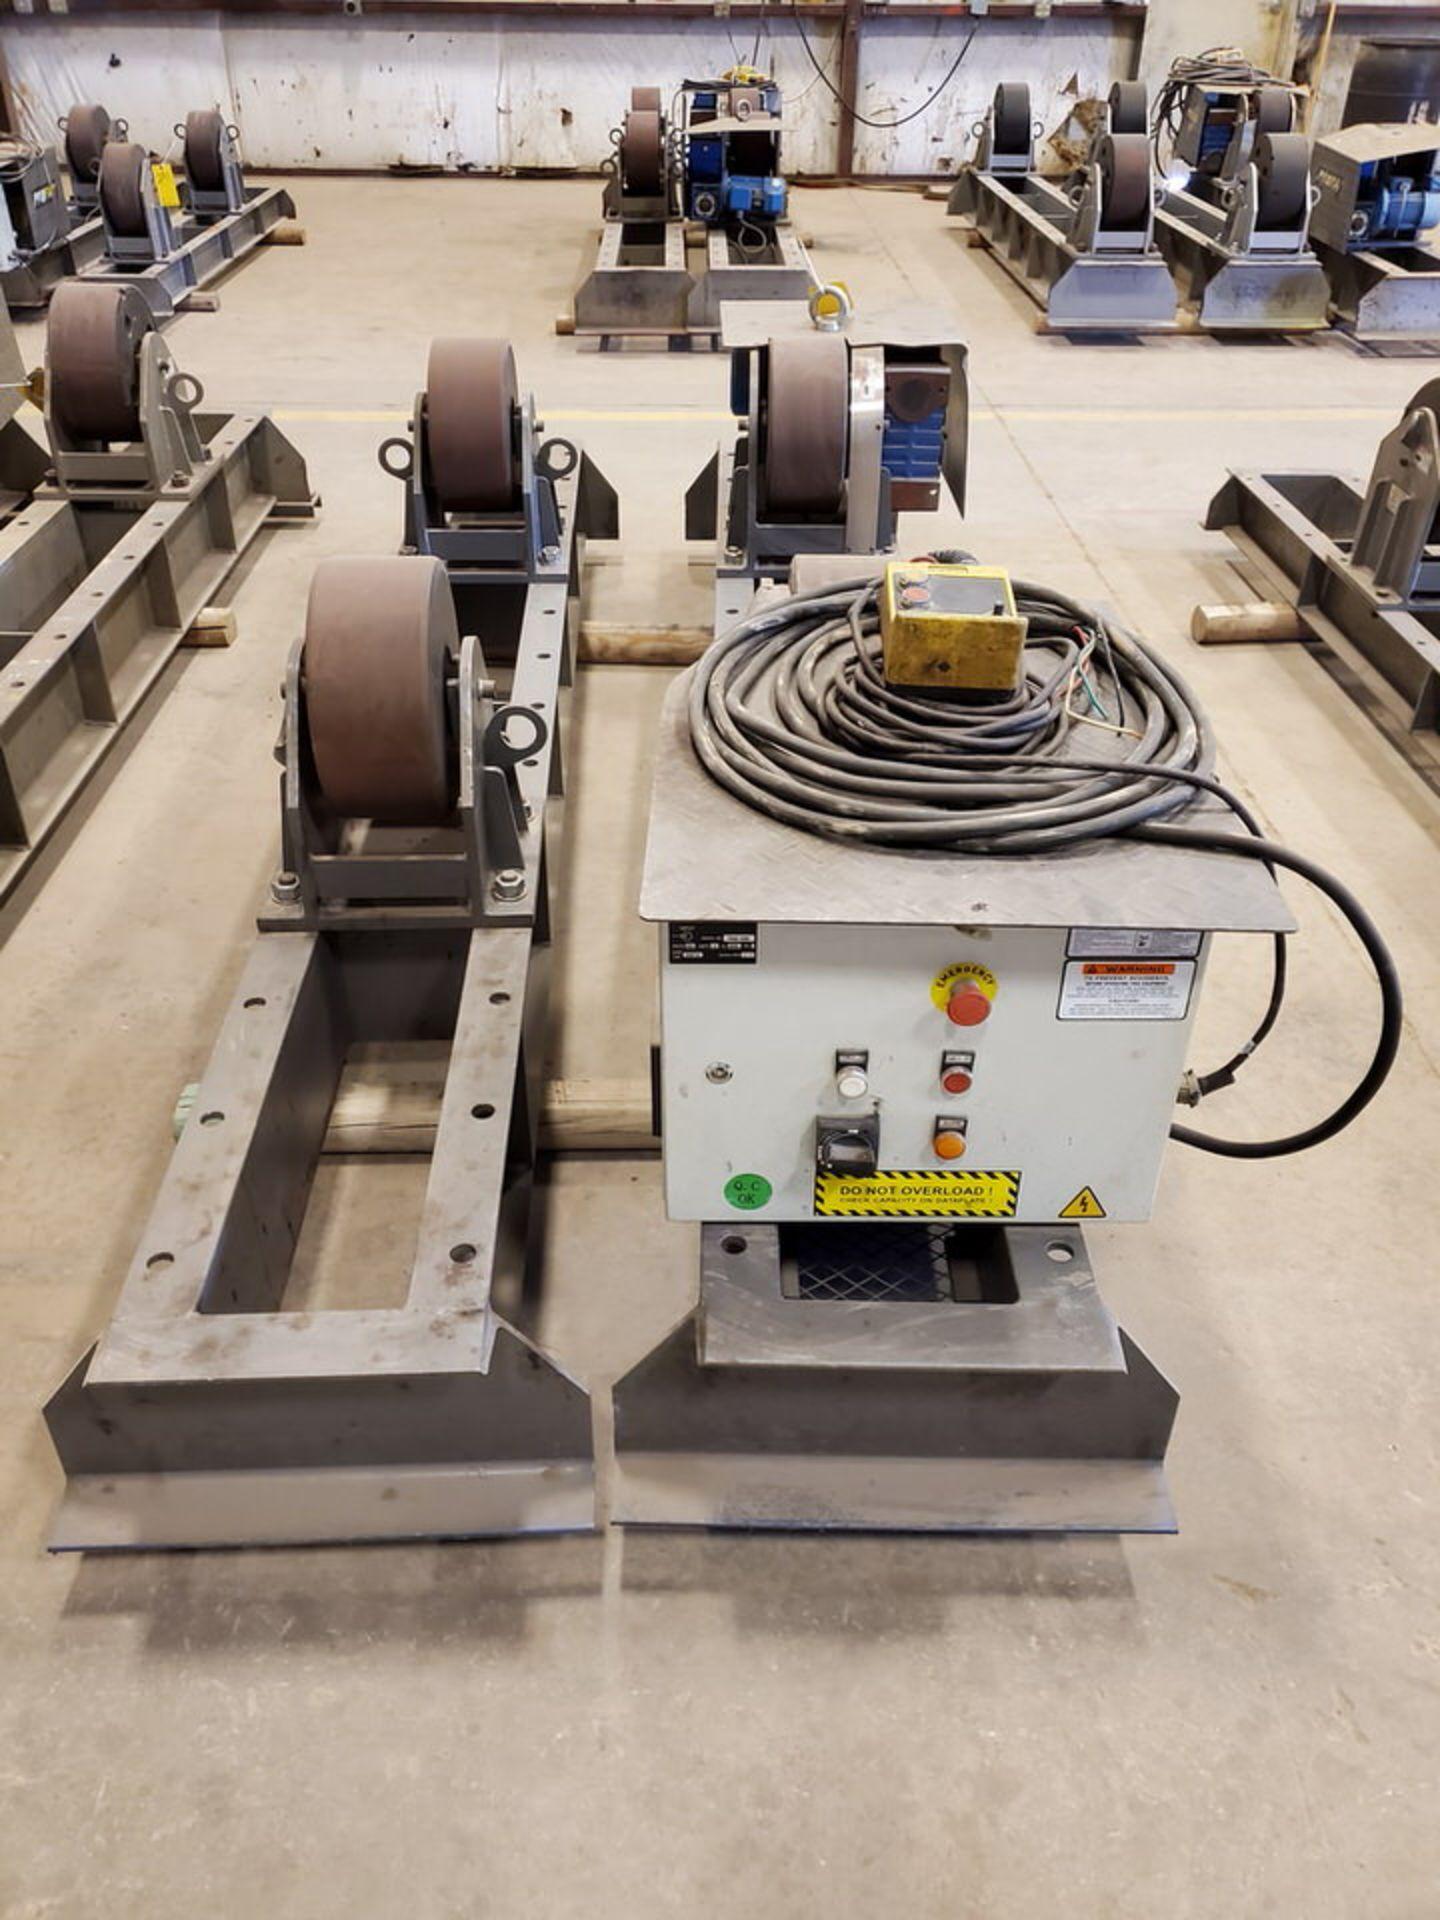 "Profax TR-40000 Turn Roll 40K Cap., 440V, 15A, 50/60HZ, 3PH, RPM: 0-1.7, 6"" Wheel Dia - Image 5 of 8"